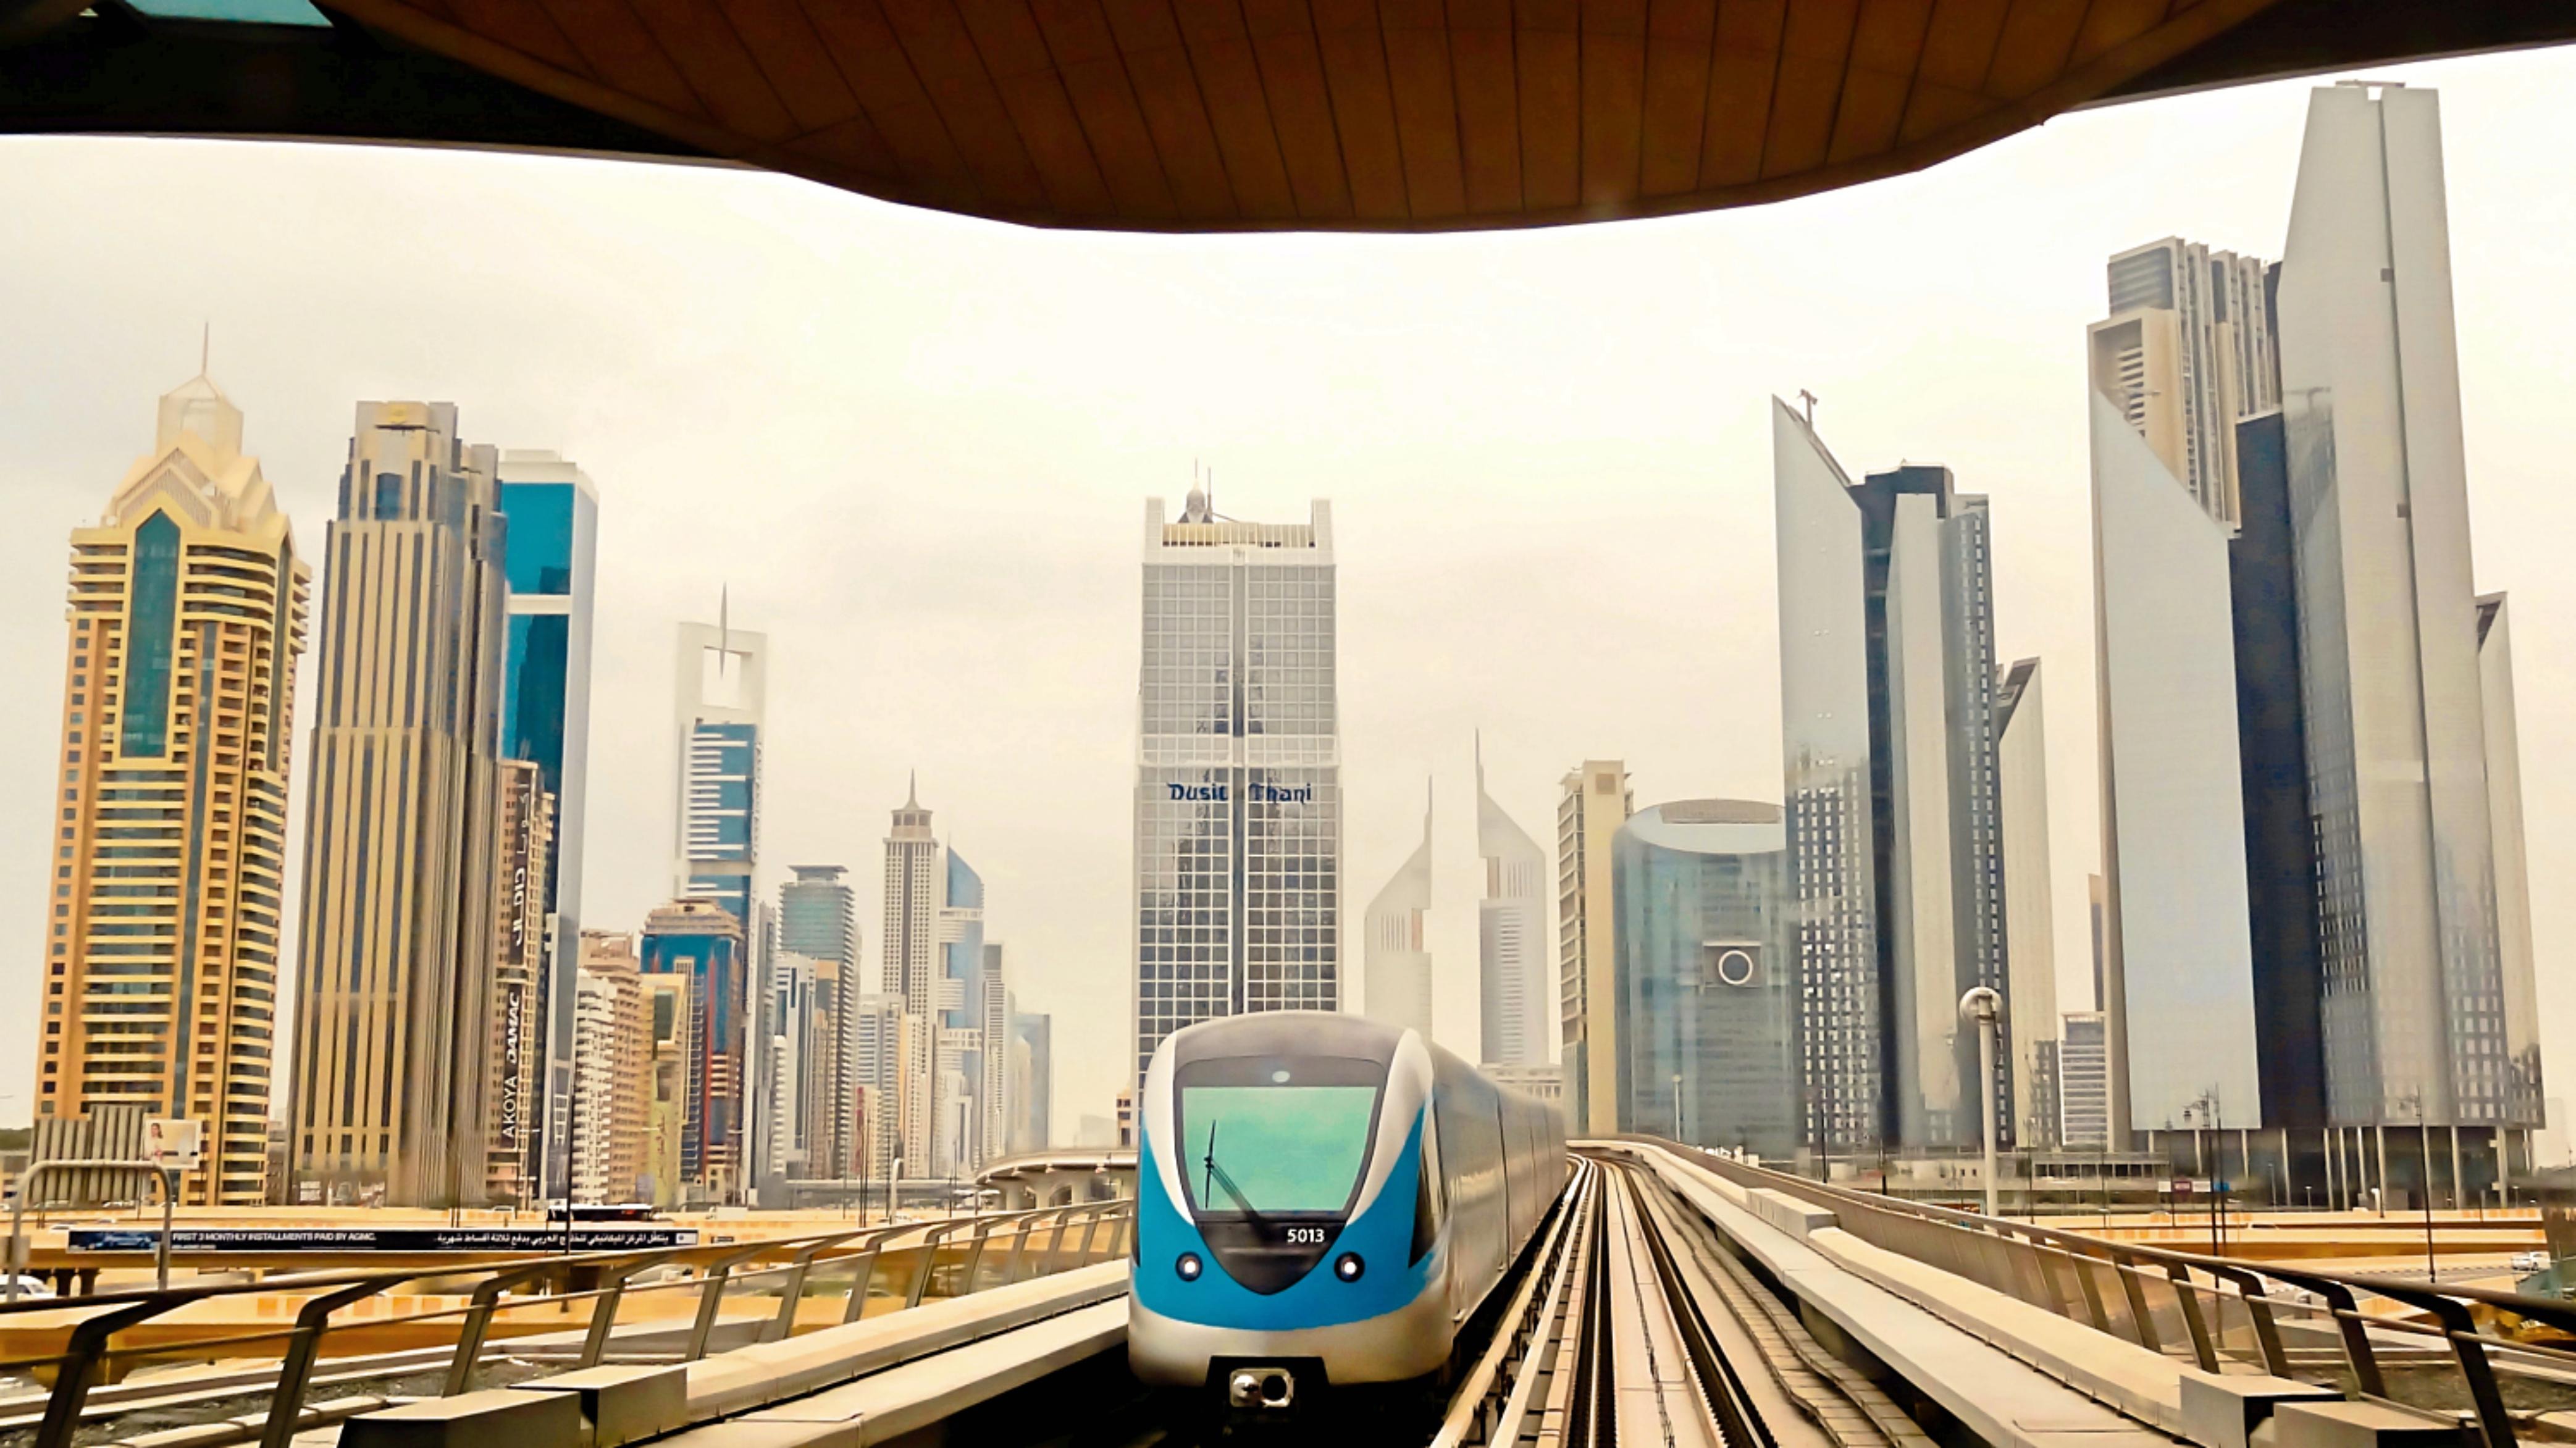 Dubai metro Sheikh Zayed Road